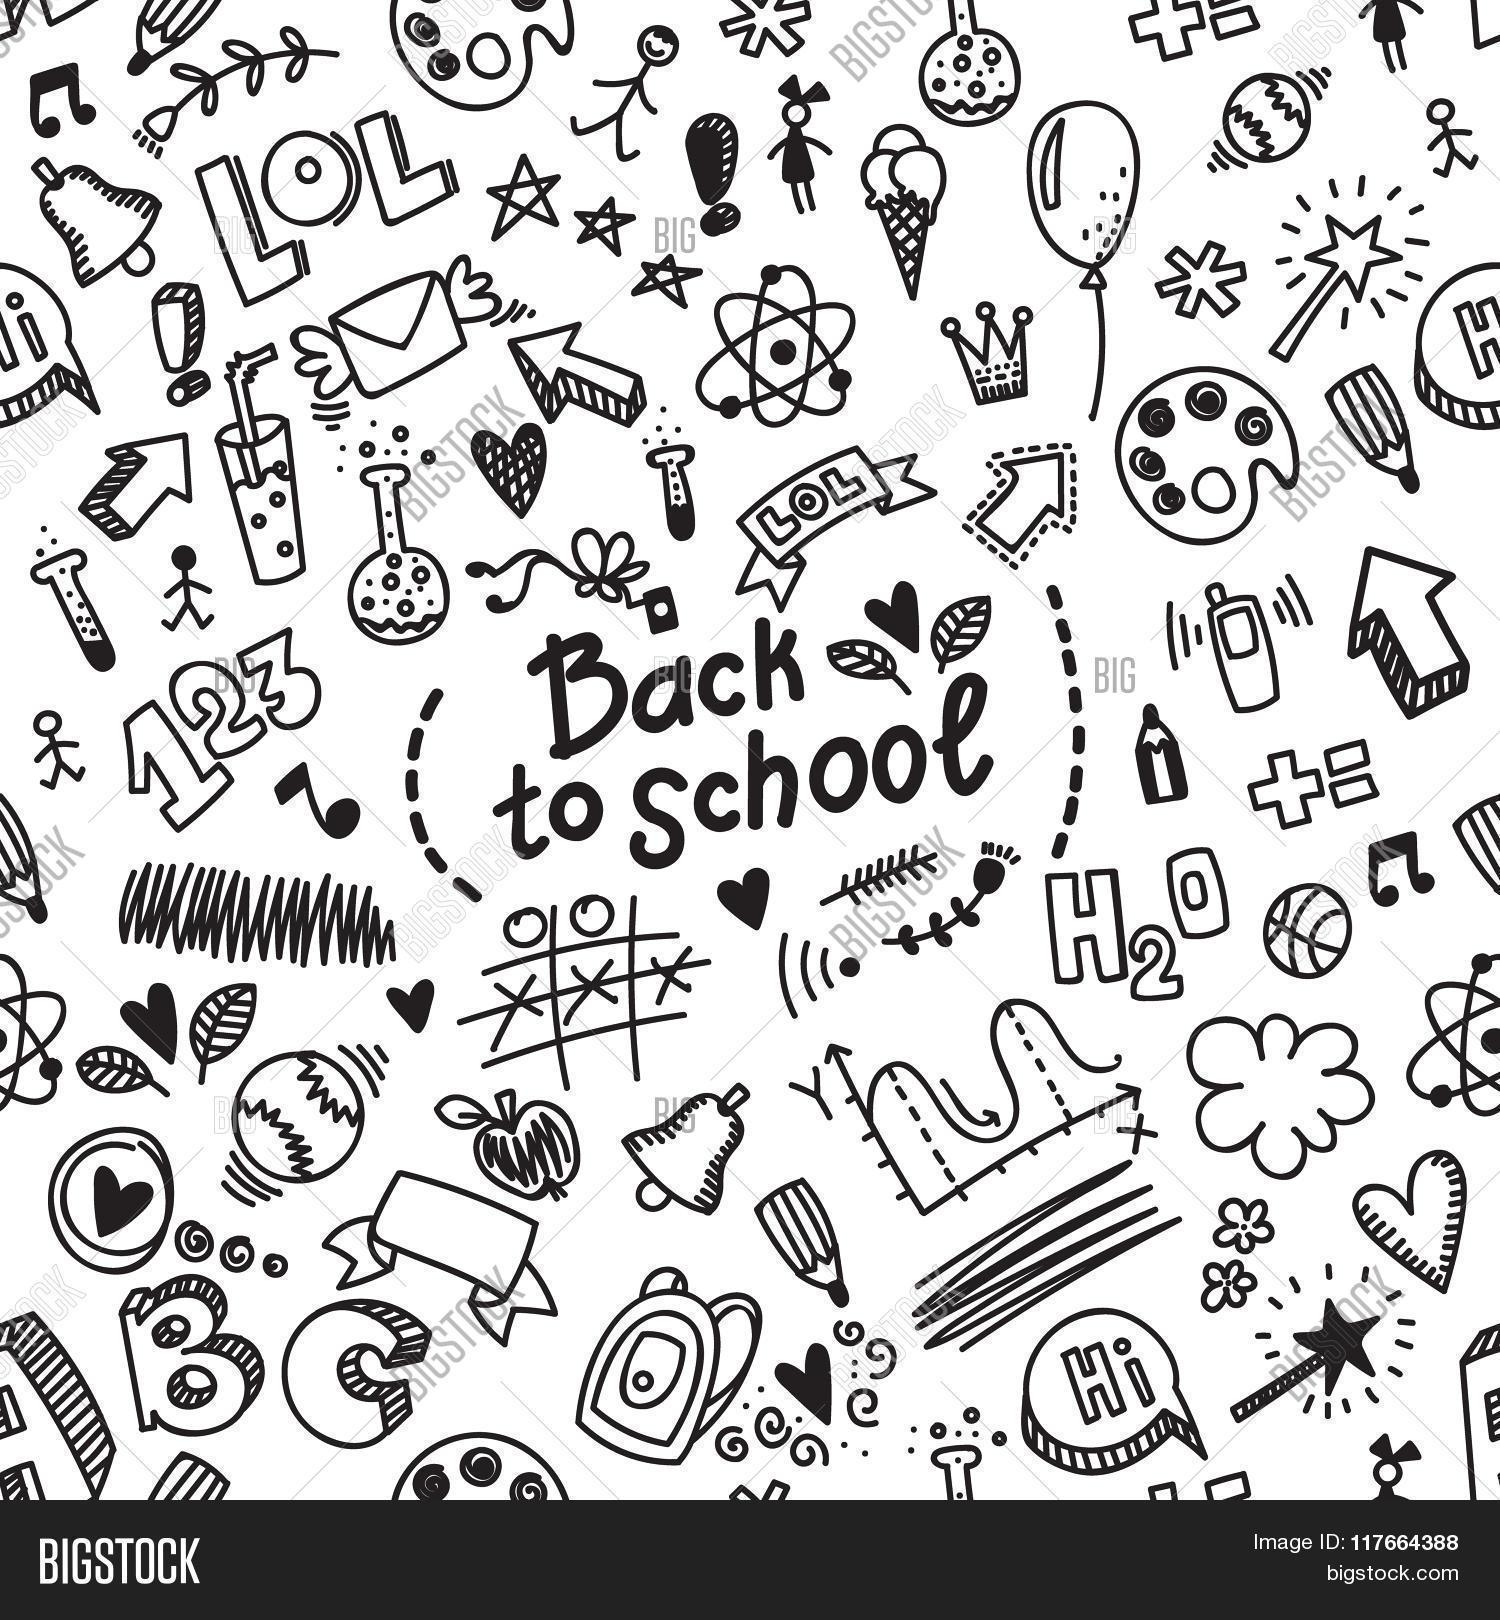 1500x1620 Drawn Background Back To School